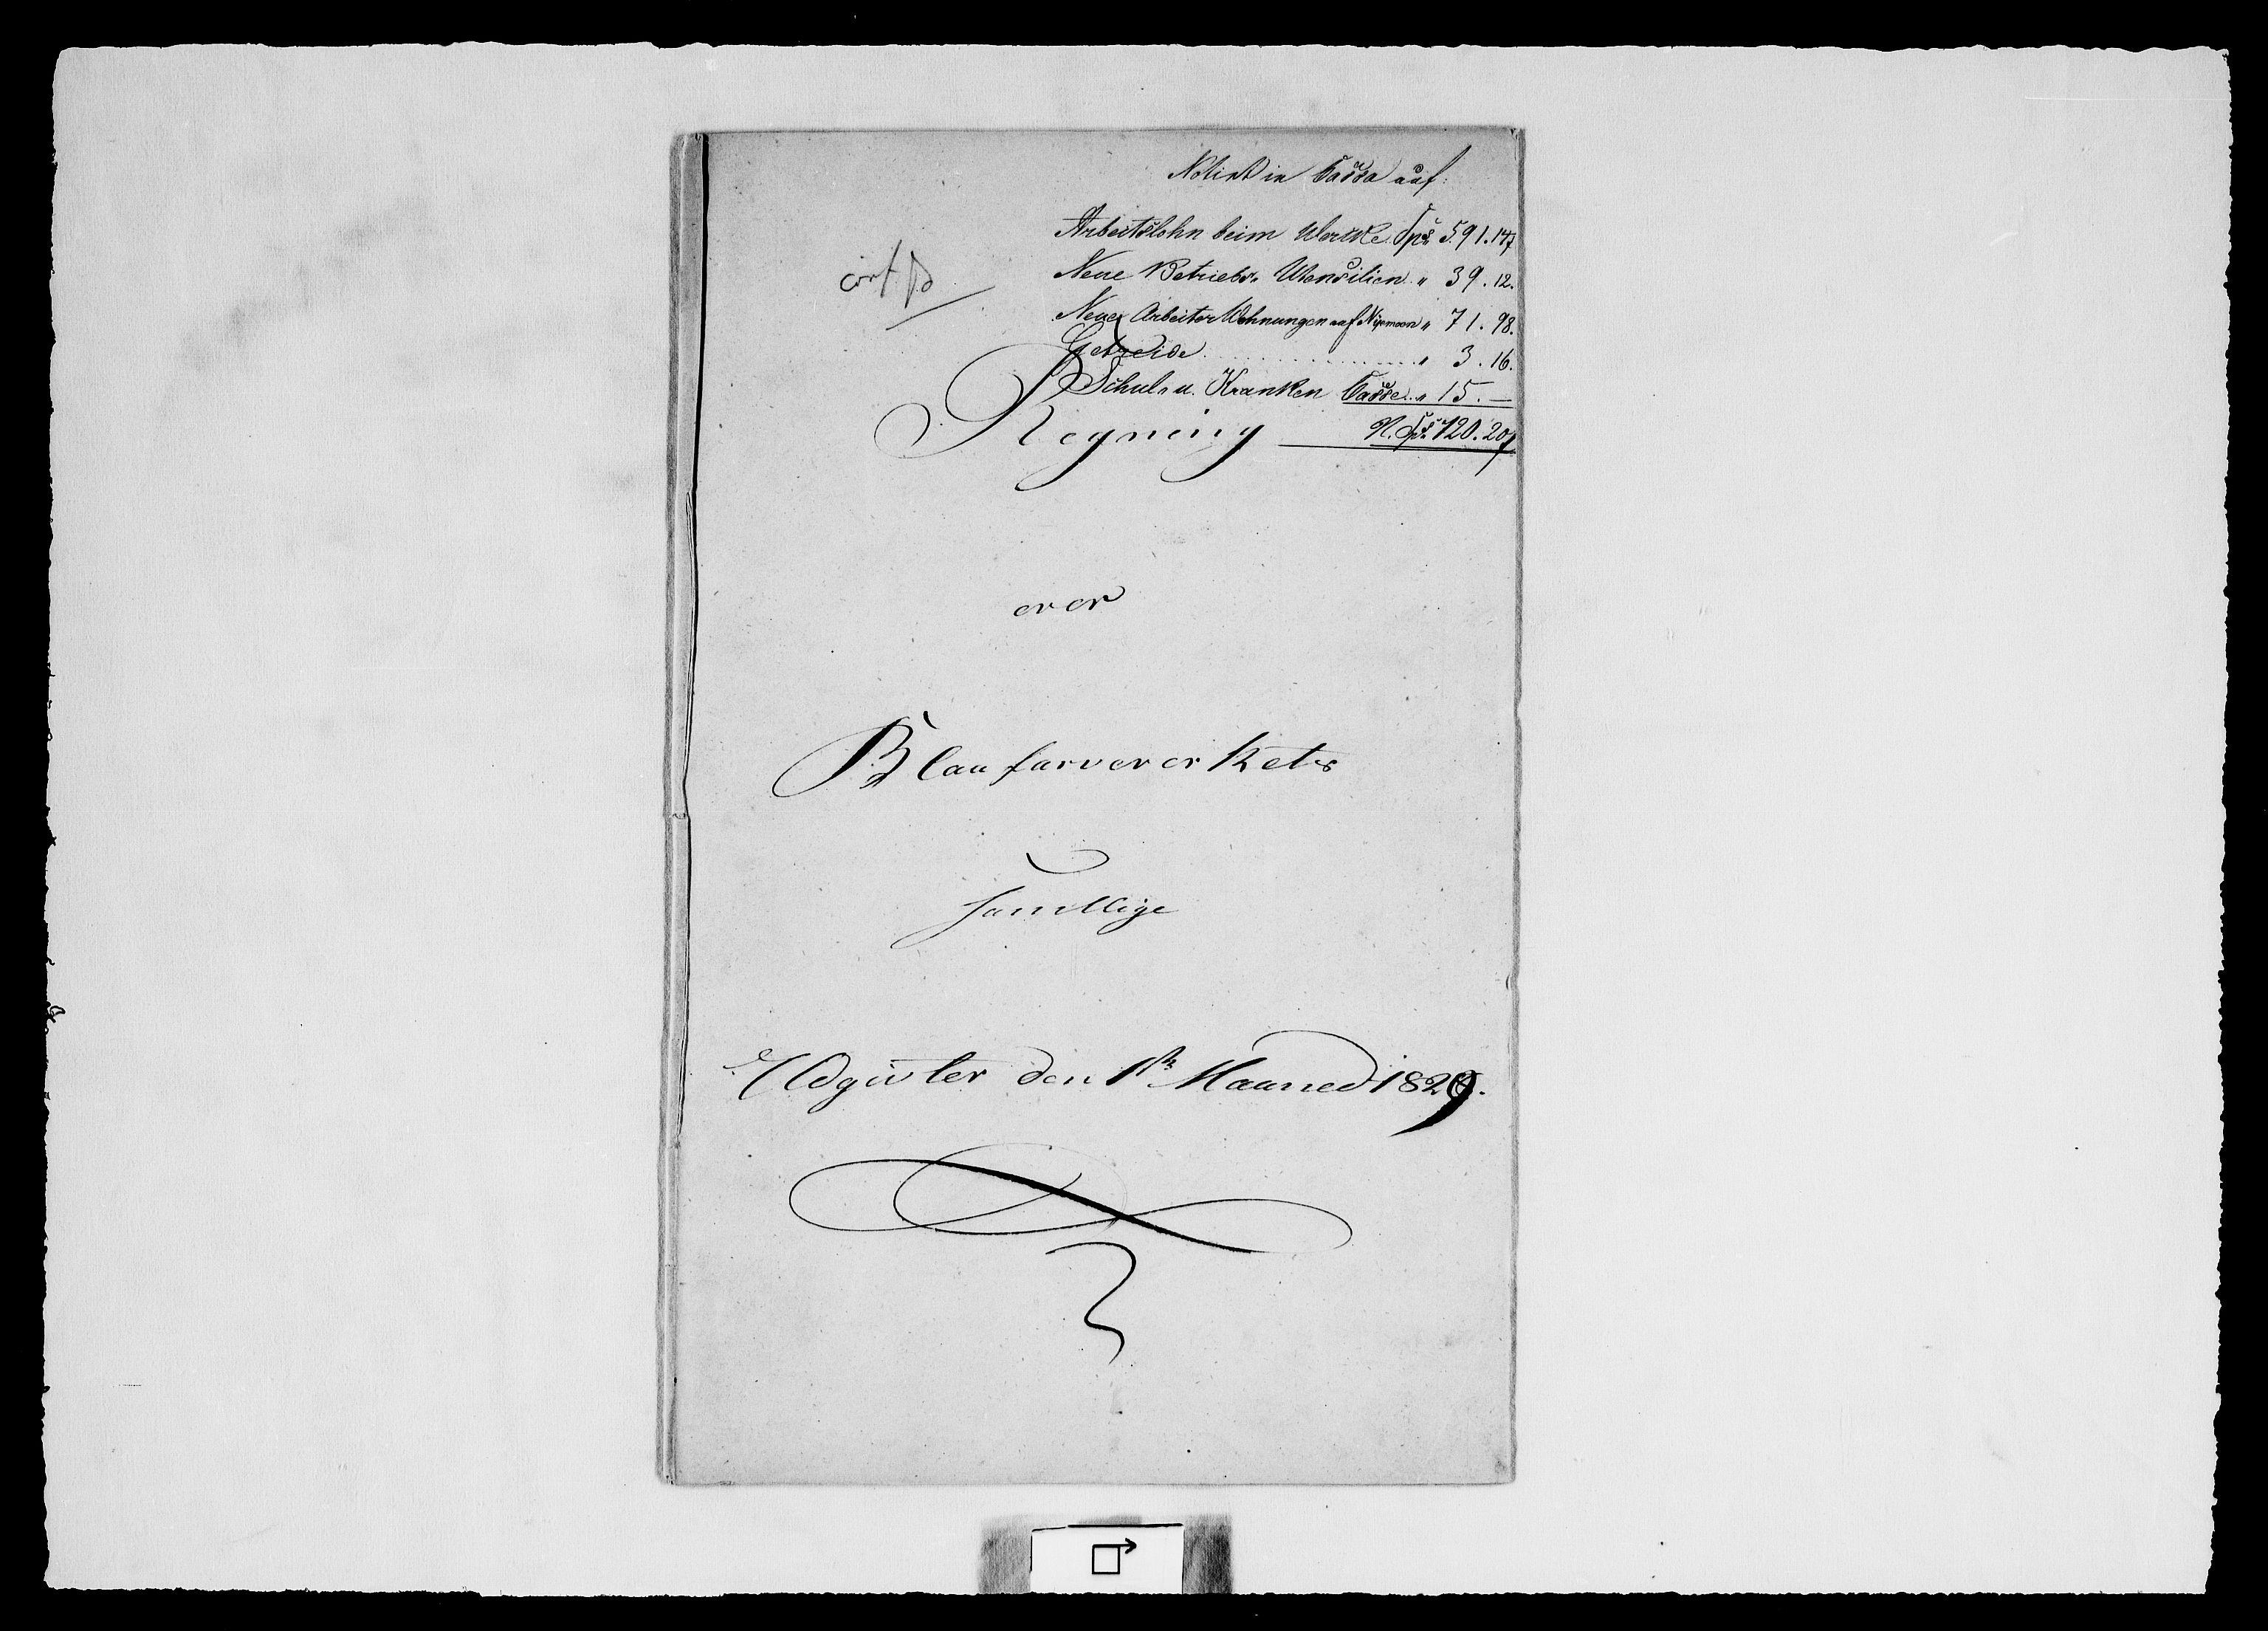 RA, Modums Blaafarveværk, G/Gd/Gdd/L0252, 1827-1832, s. 2